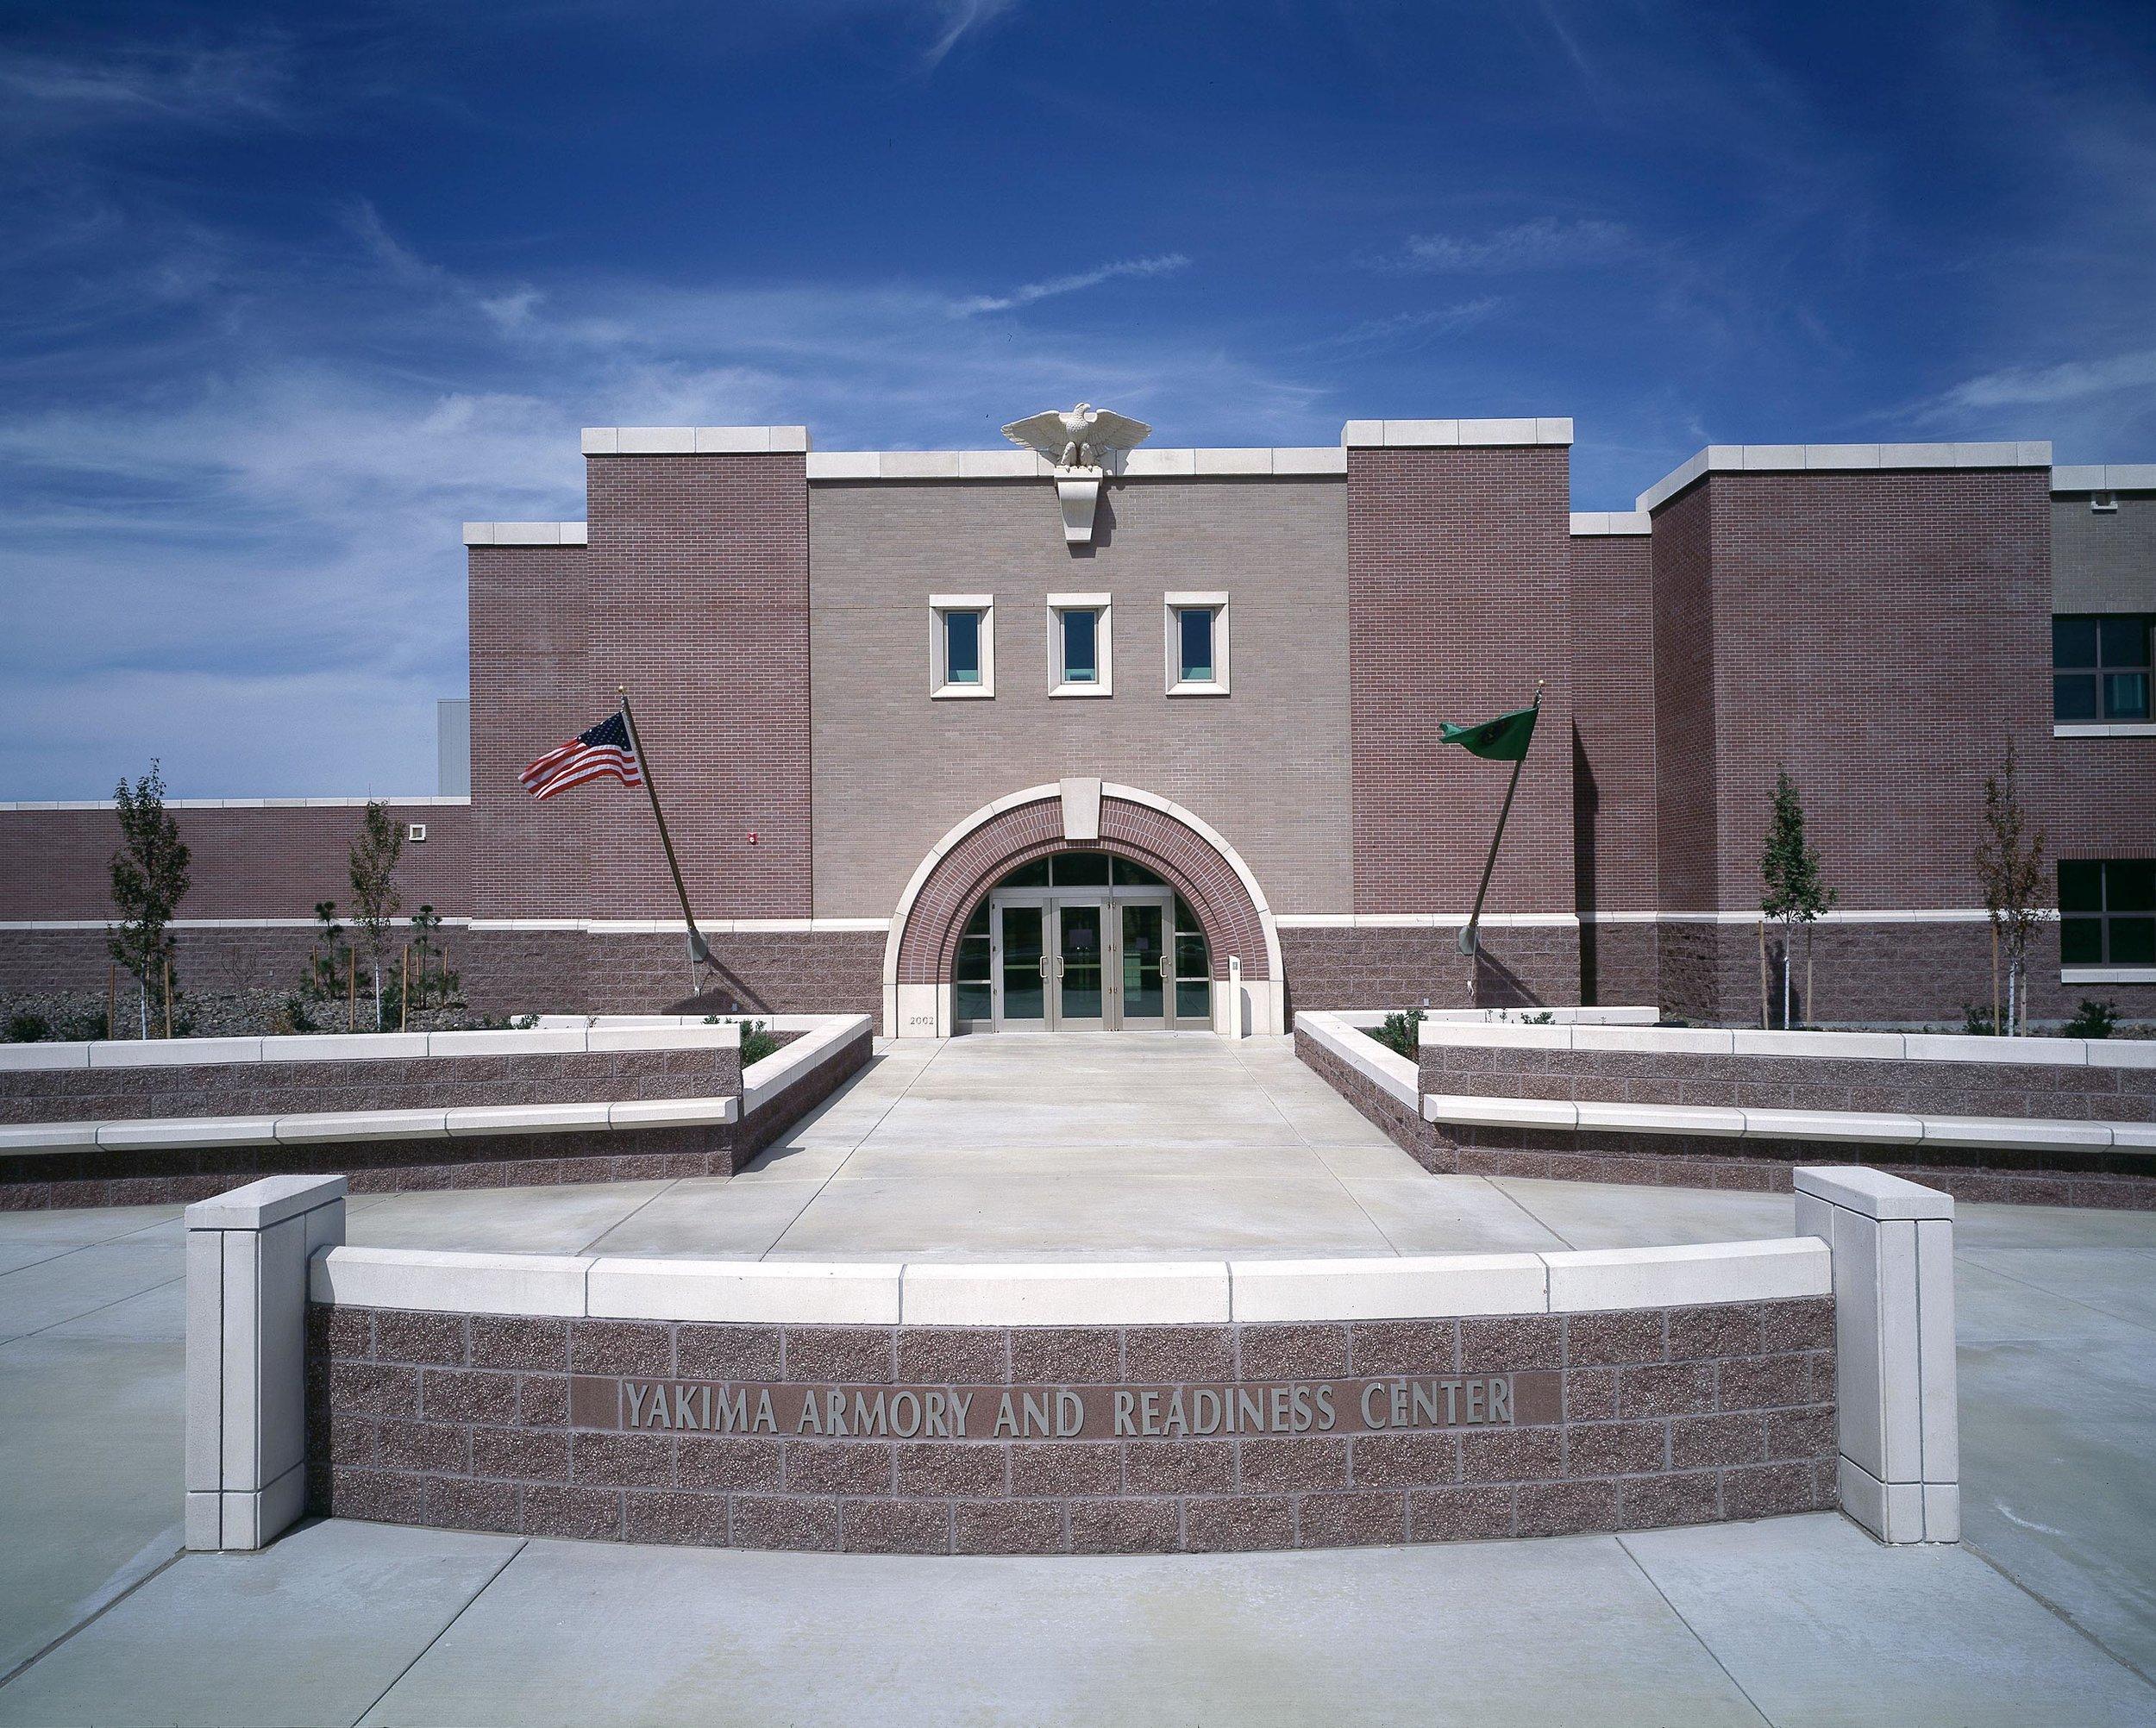 Yakima Readiness Center 100.jpg